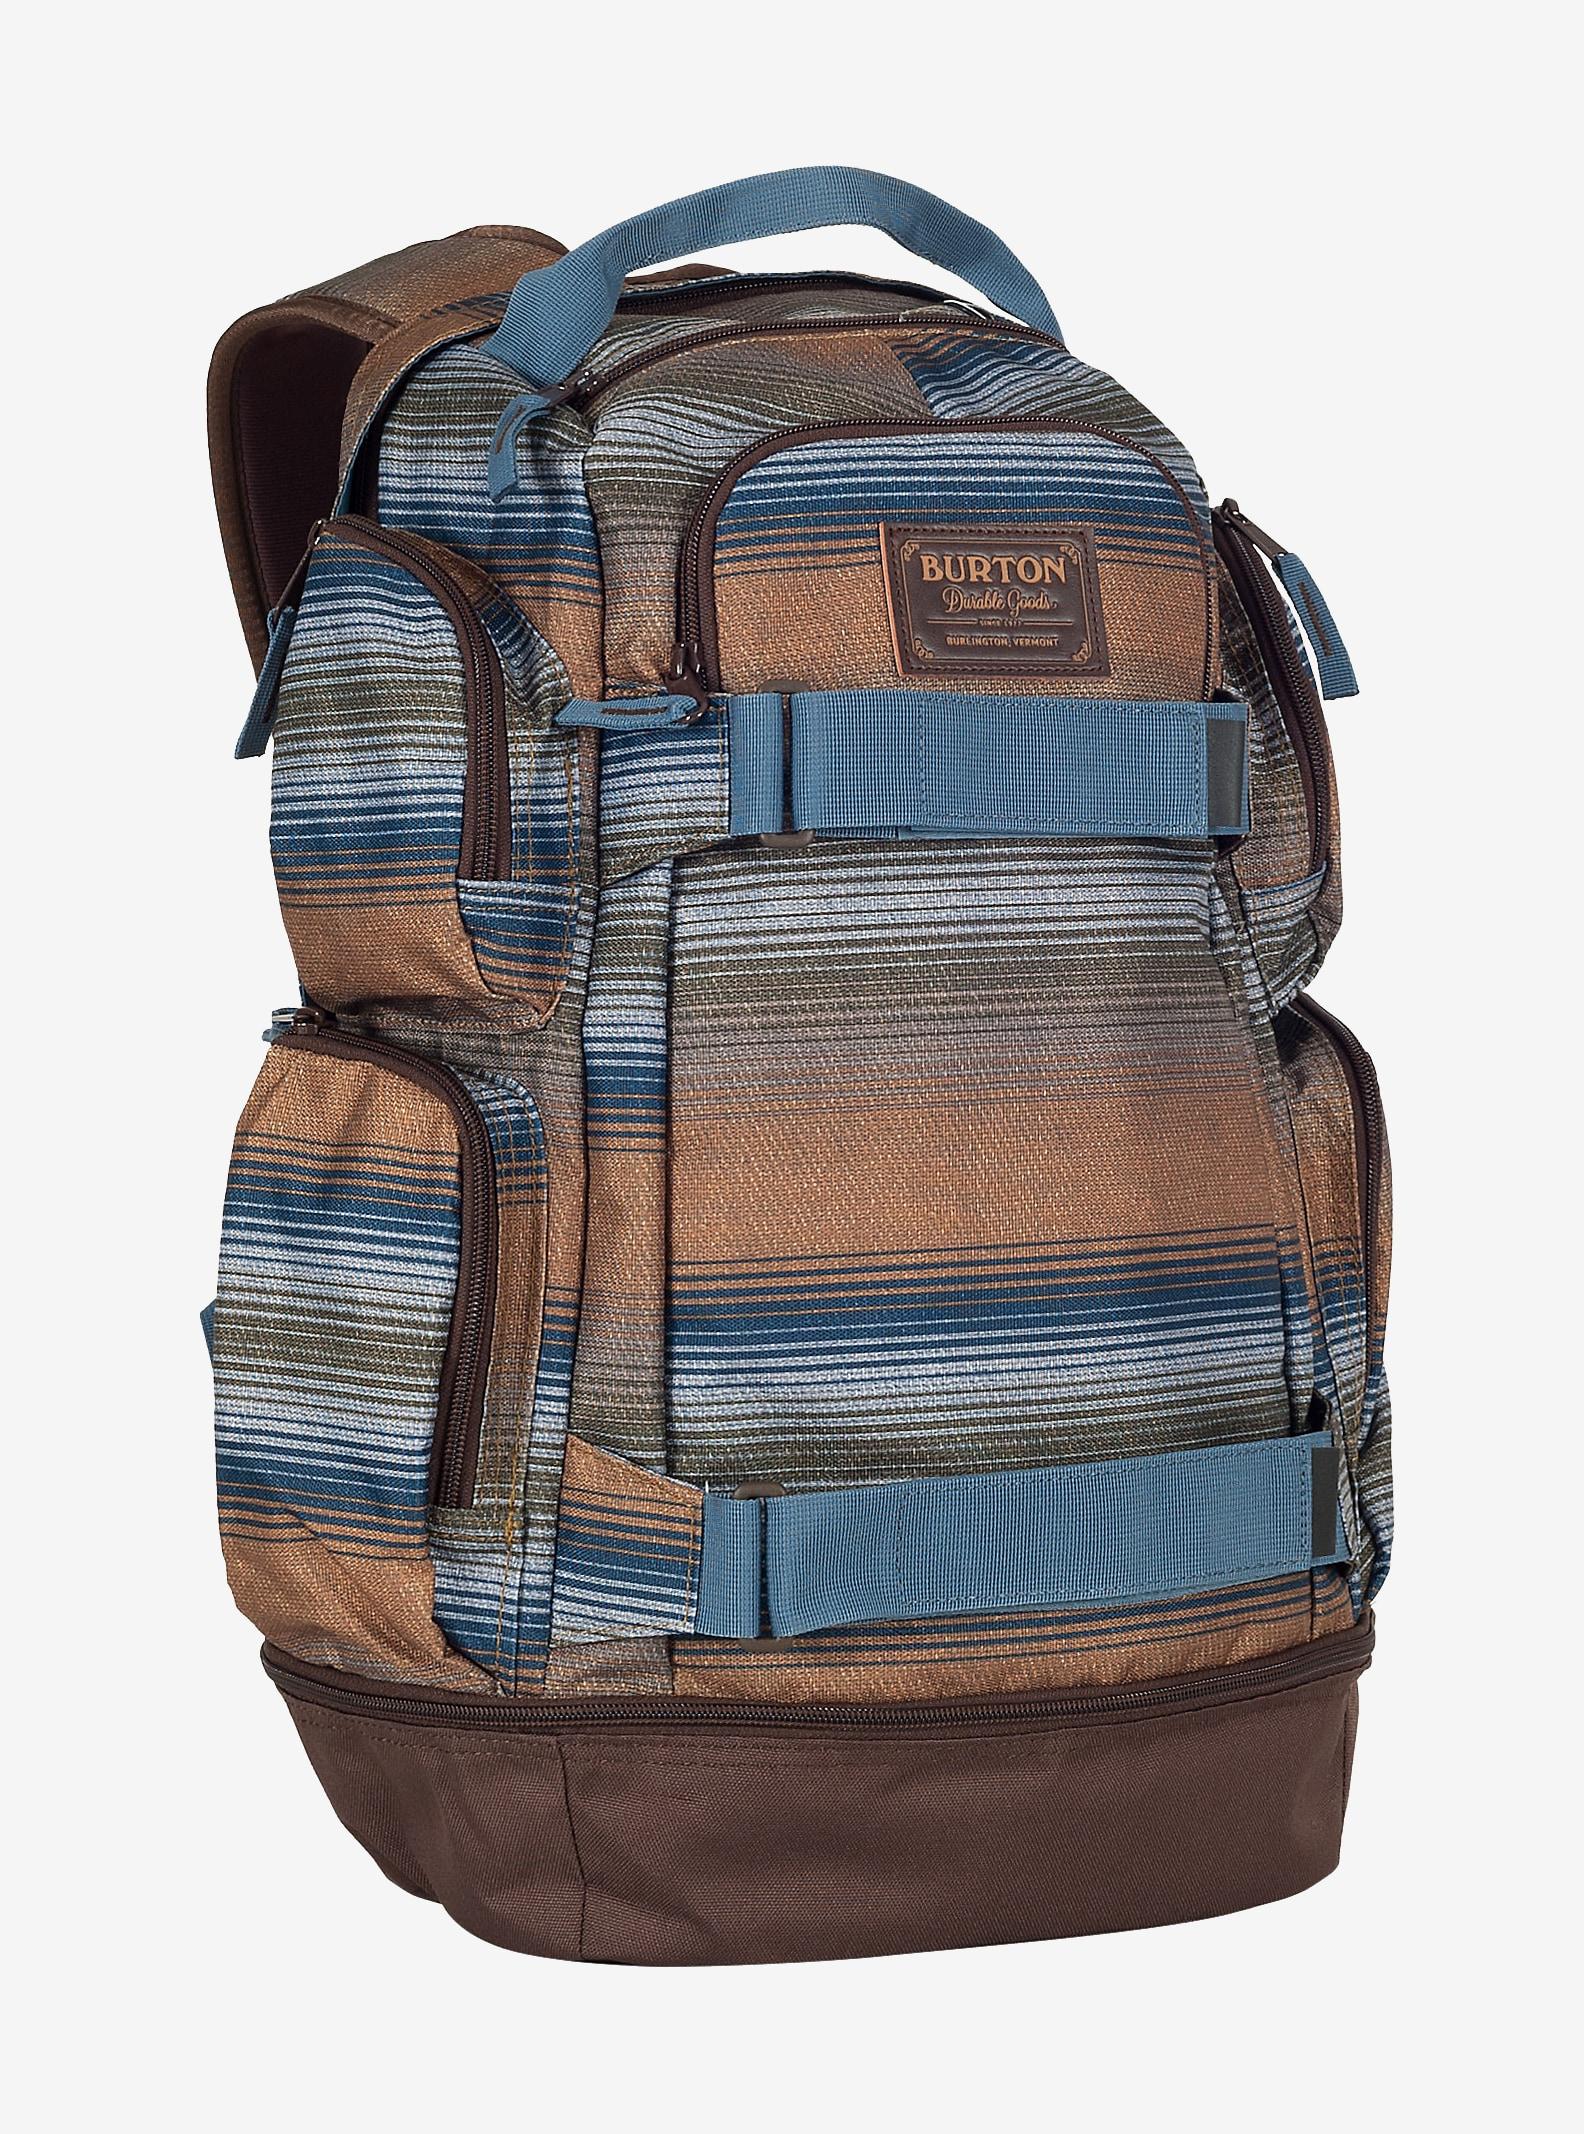 Burton Distortion Backpack shown in Beach Stripe Print